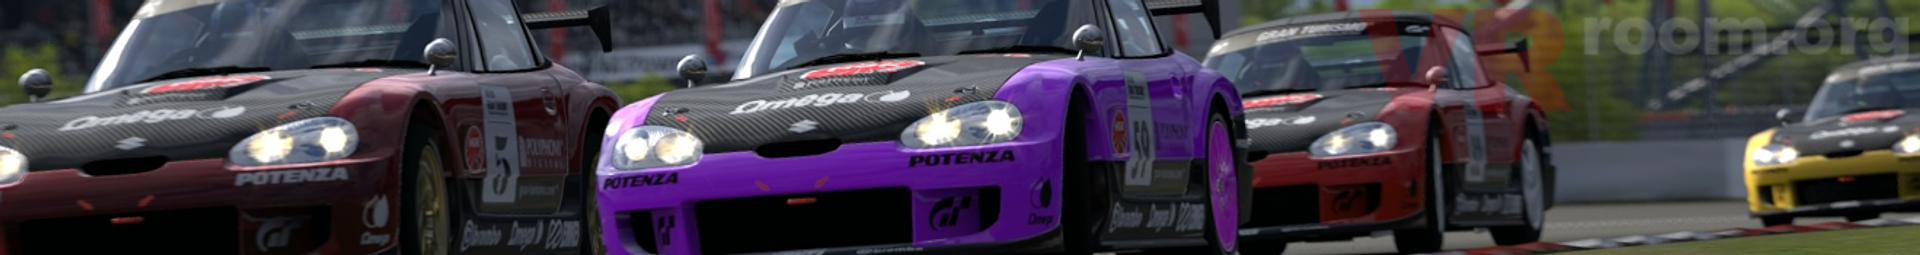 Gran Turismo 6 Leagues